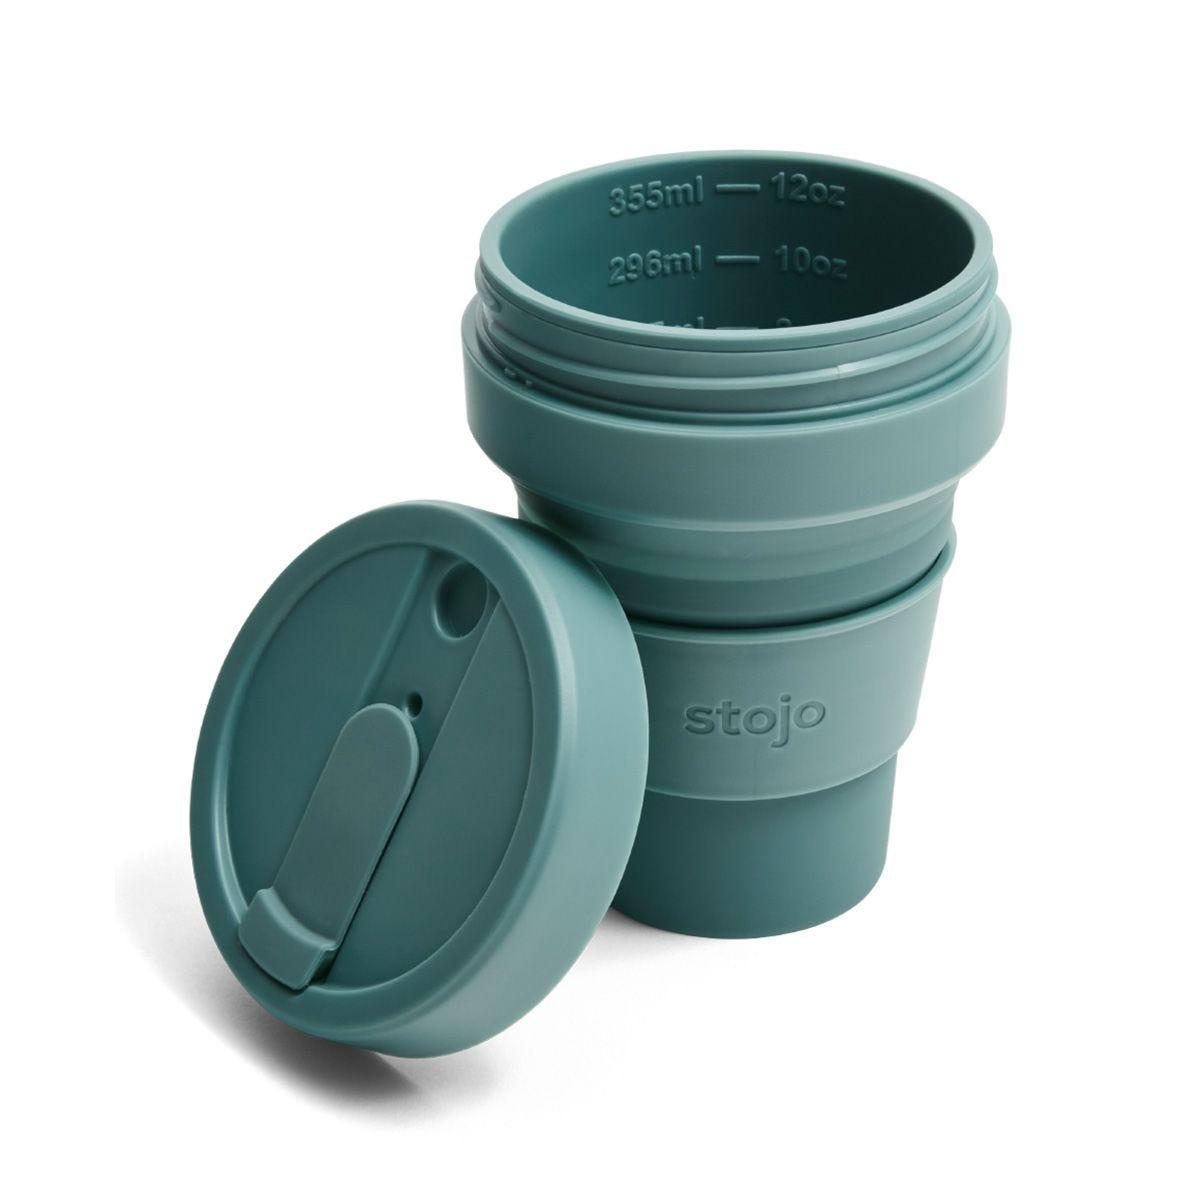 Stojo Collapsible Pocket Cup 12oz - Eucalyptus